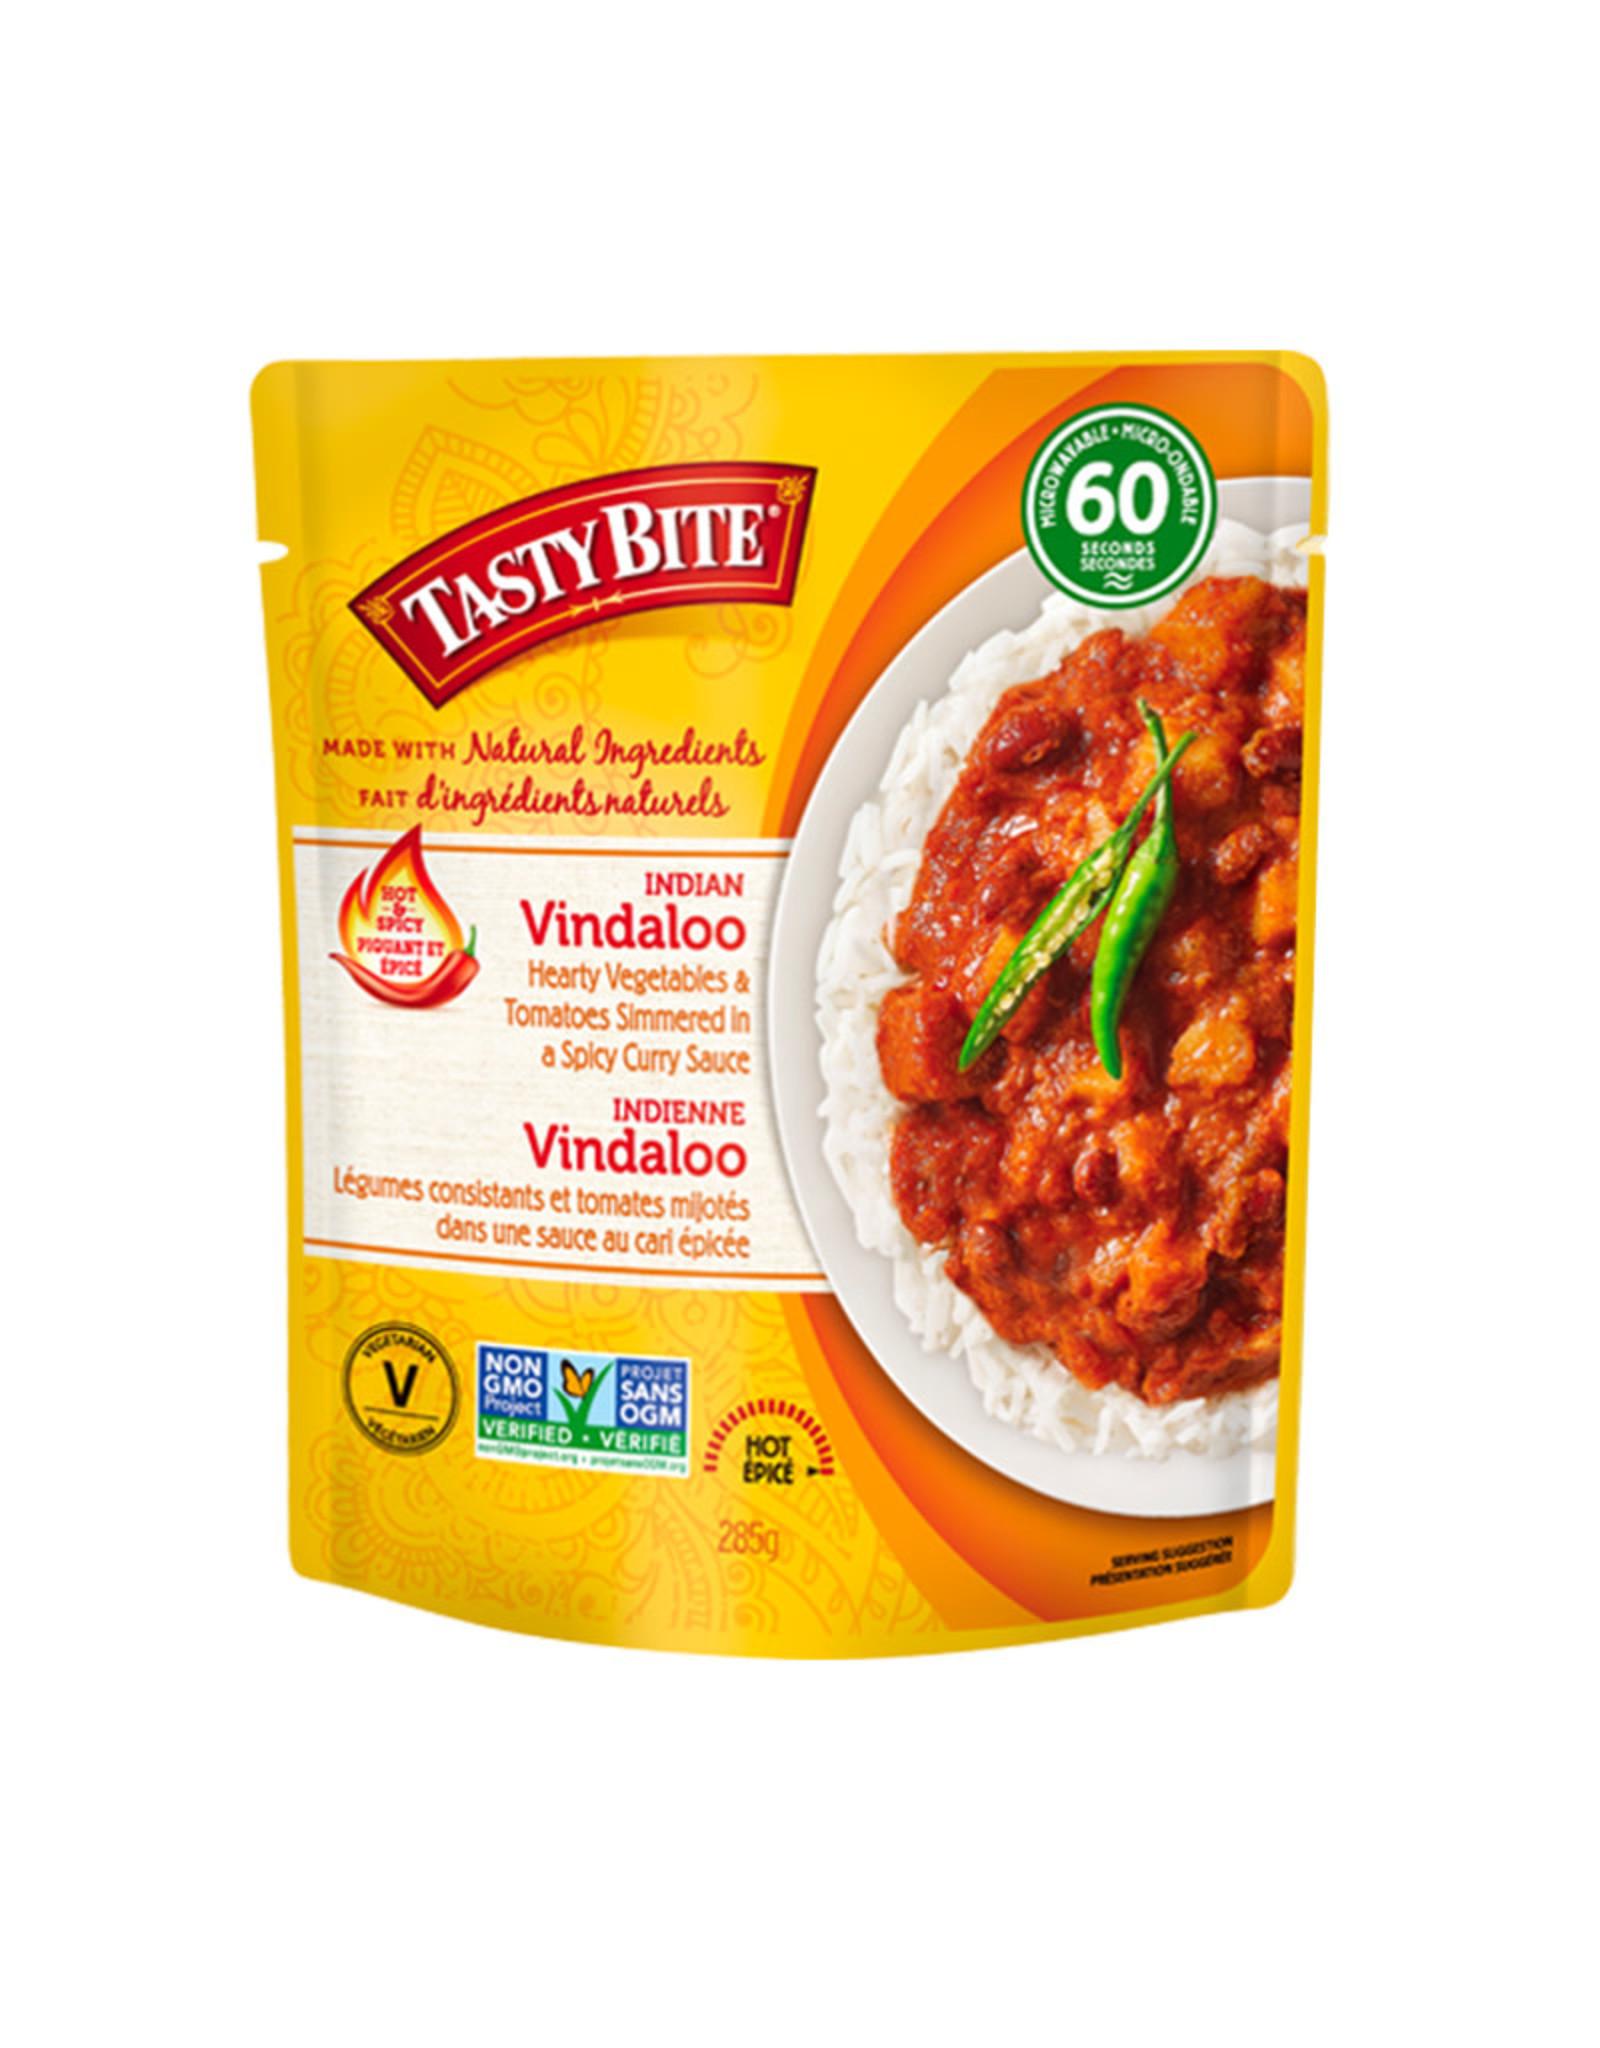 Tasty Bite Tasty Bite - Indian Vindaloo Hot & Spicy (285g)